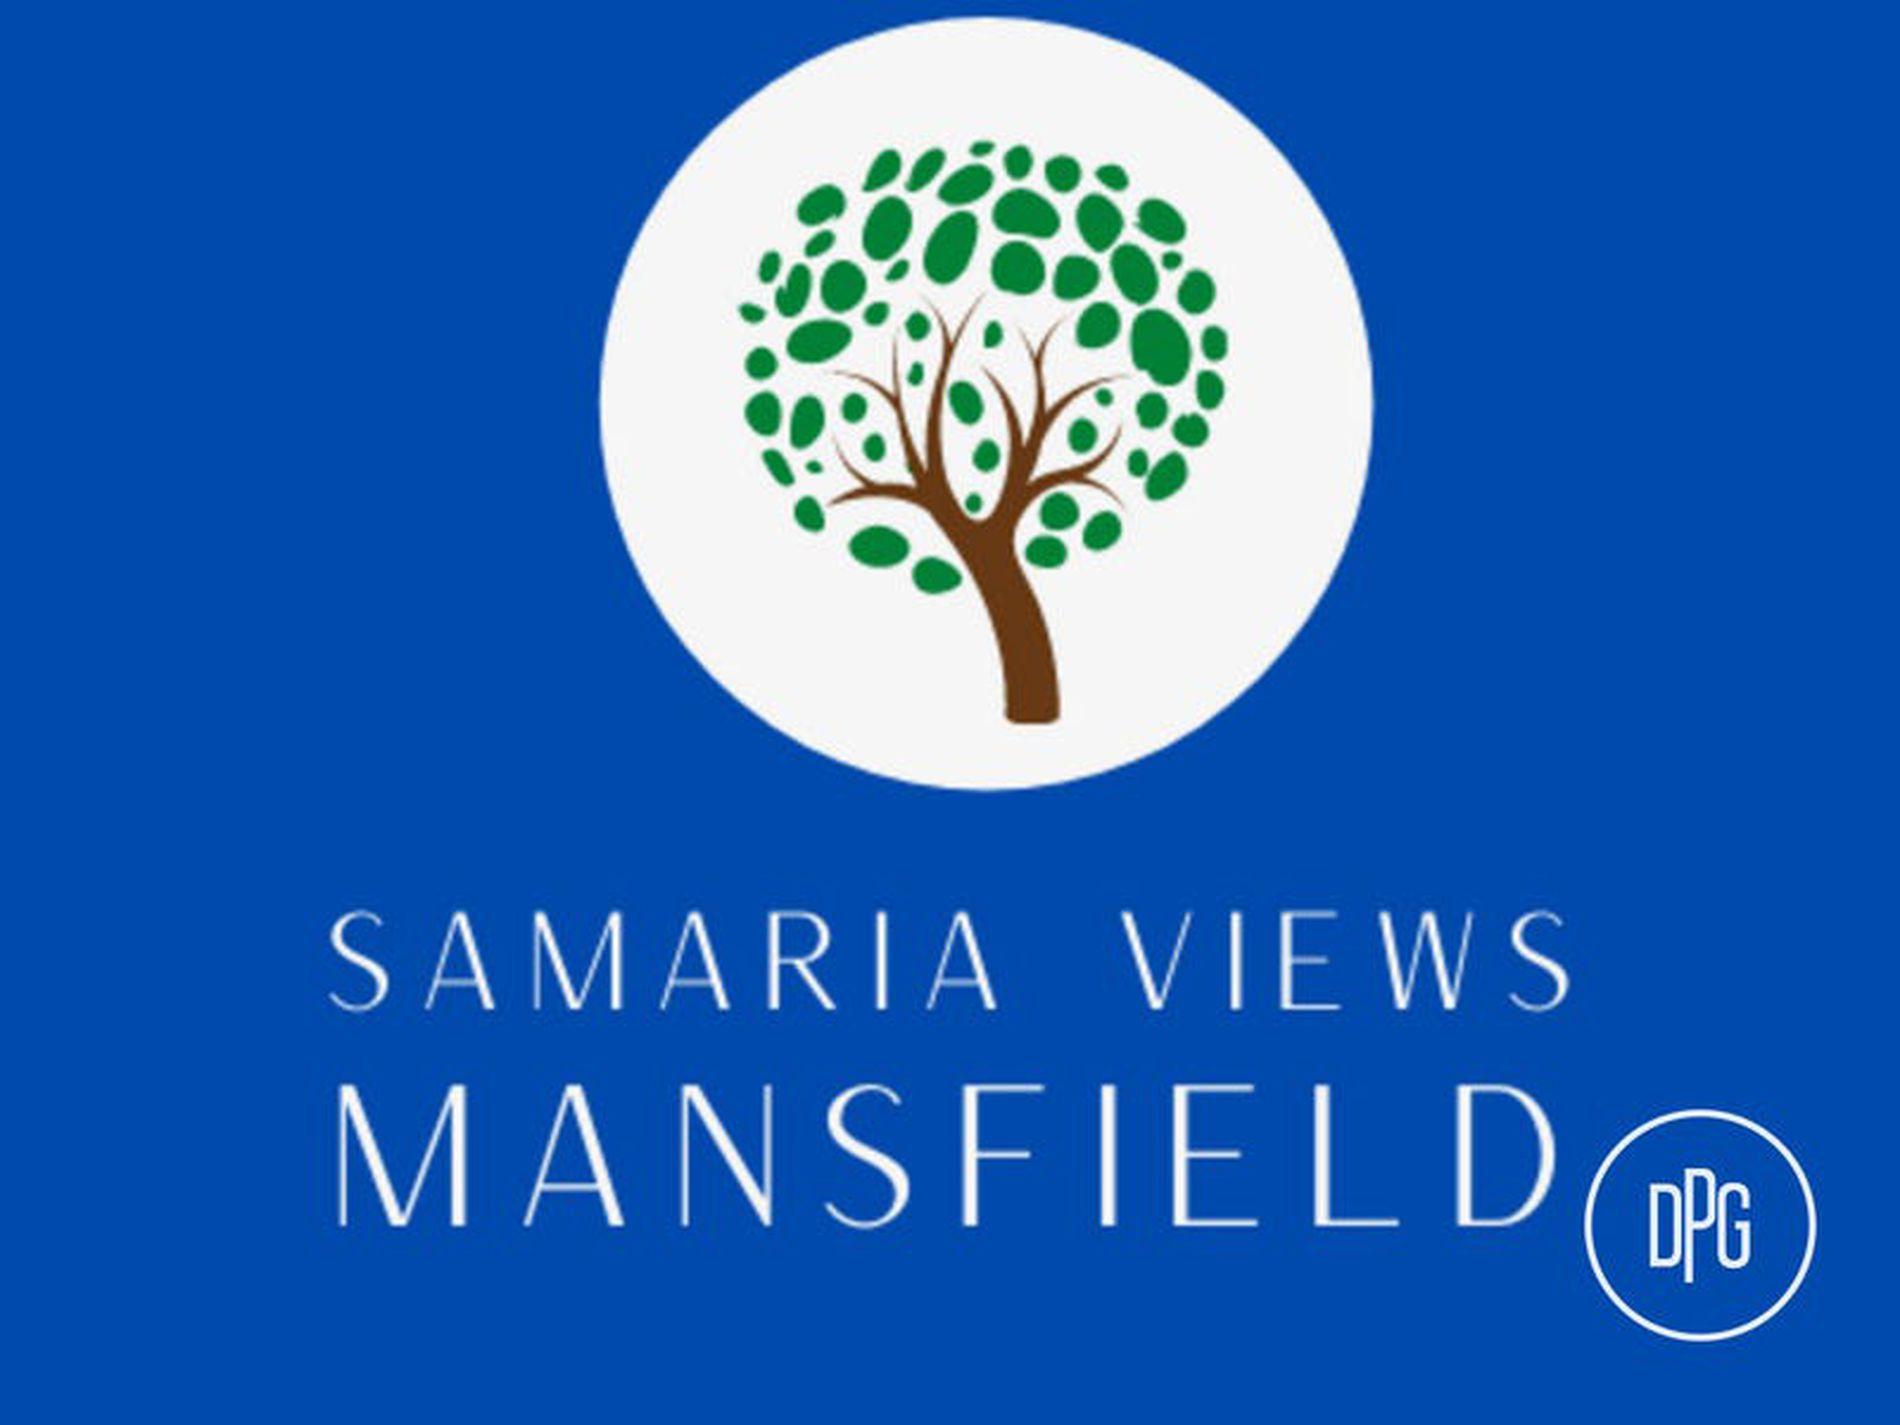 Lot 92, Samaria Views, Mansfield